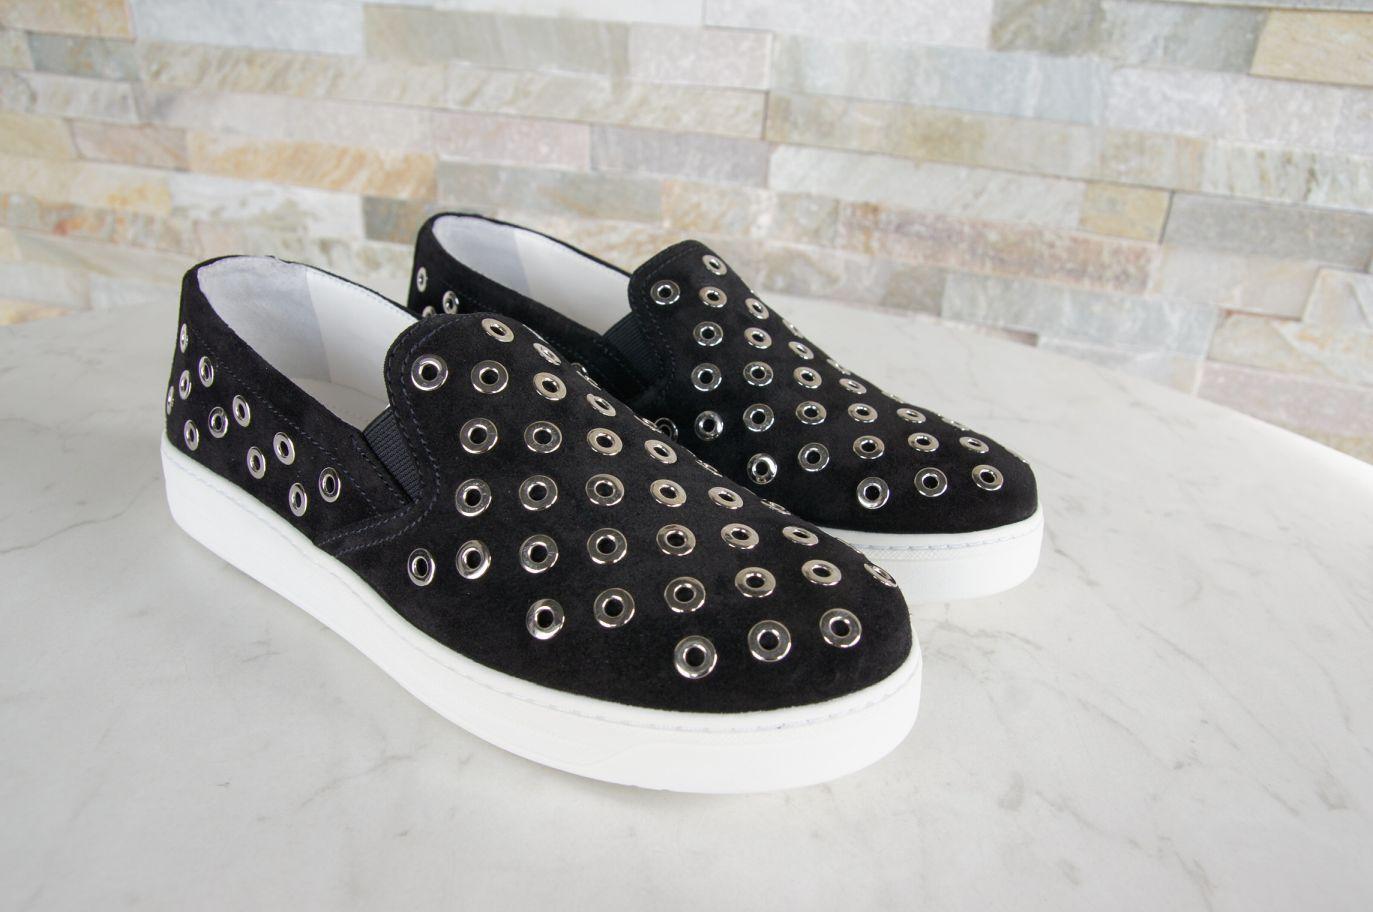 PRADA Gr 39 Slipper Sneakers 3S6159 Slip On Schuhe Suede 3S6159 Sneakers schwarz NEU 6e984e